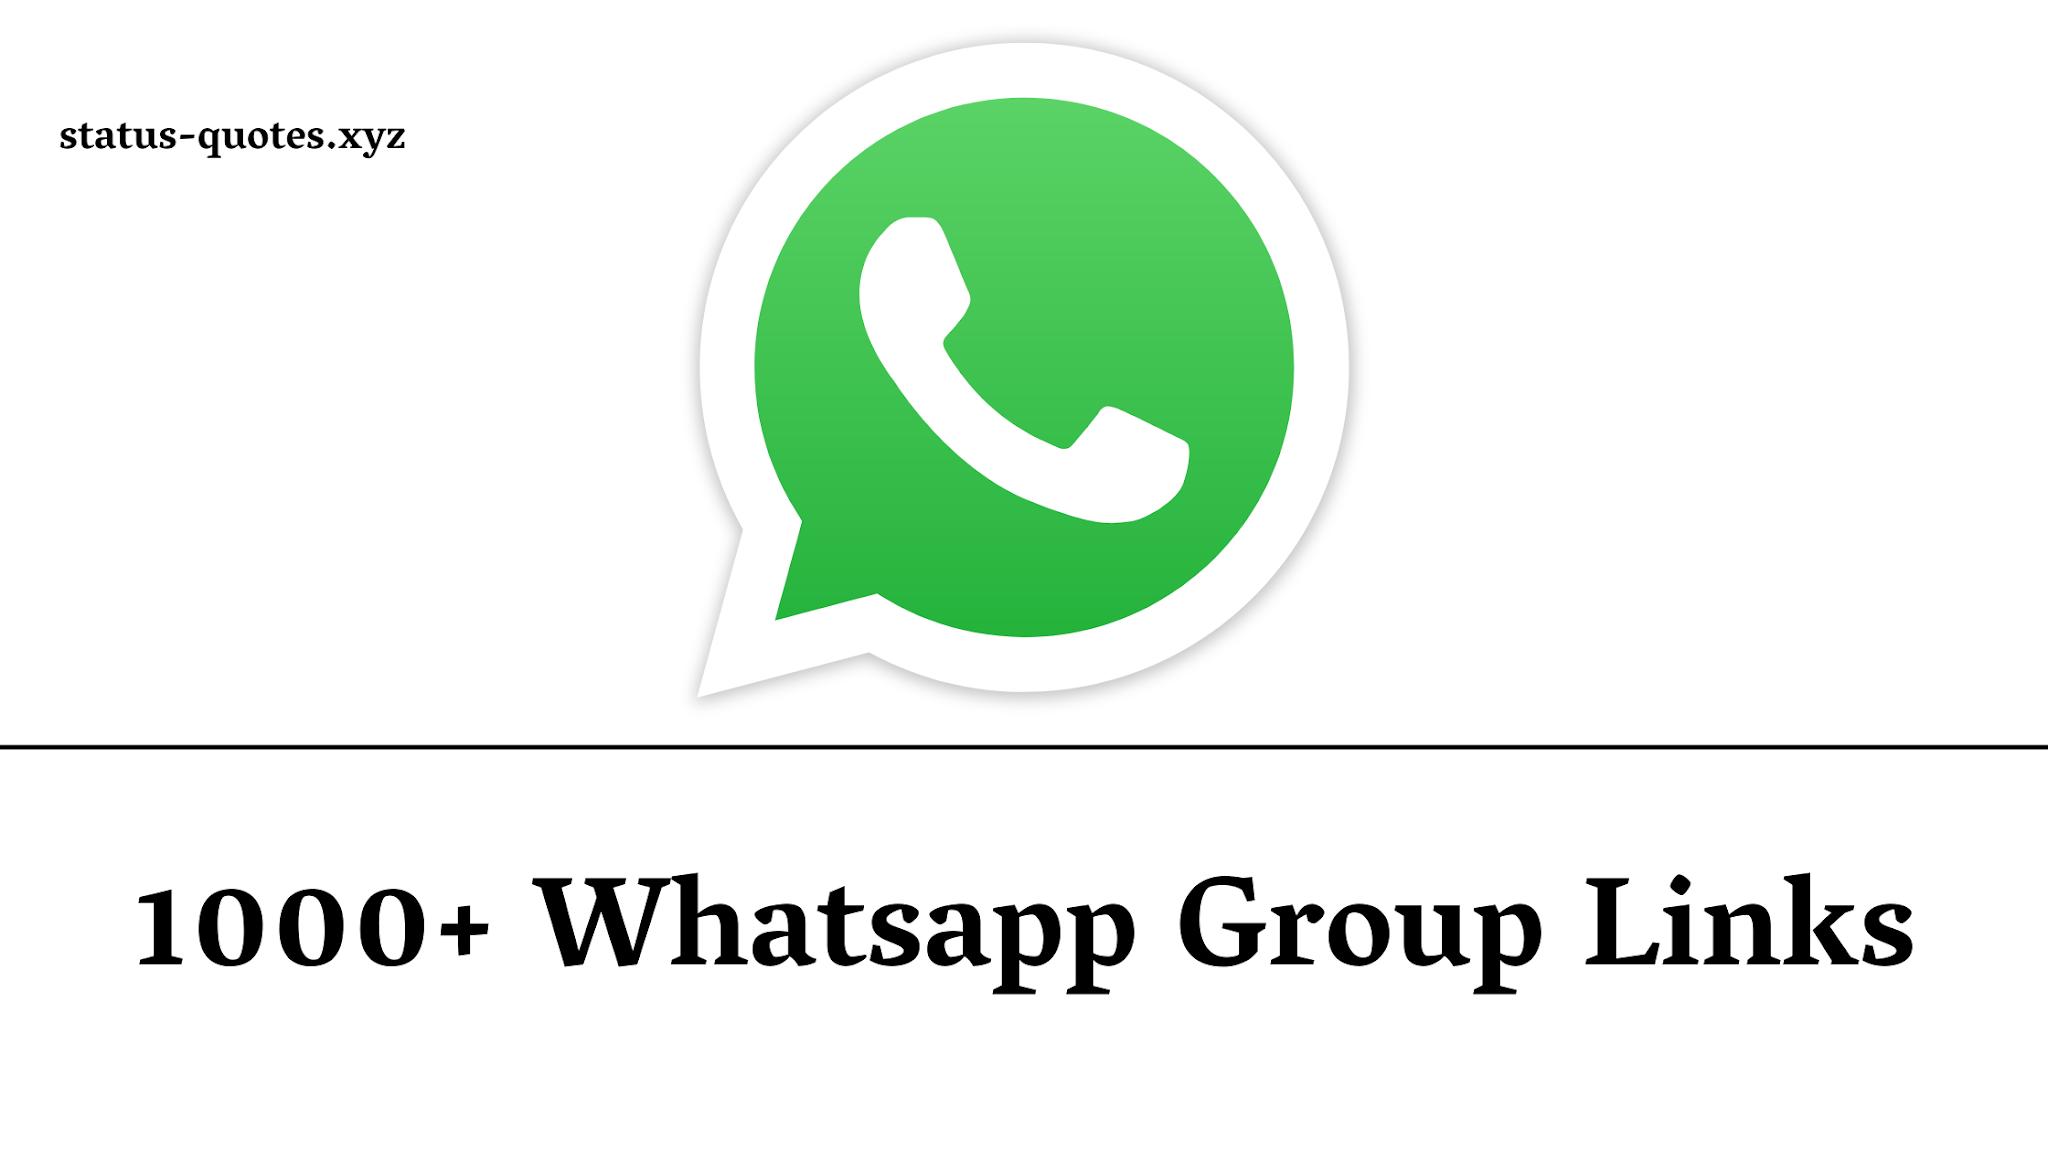 Up dating best 2021 ☝️ whatsapp groups USA Girls